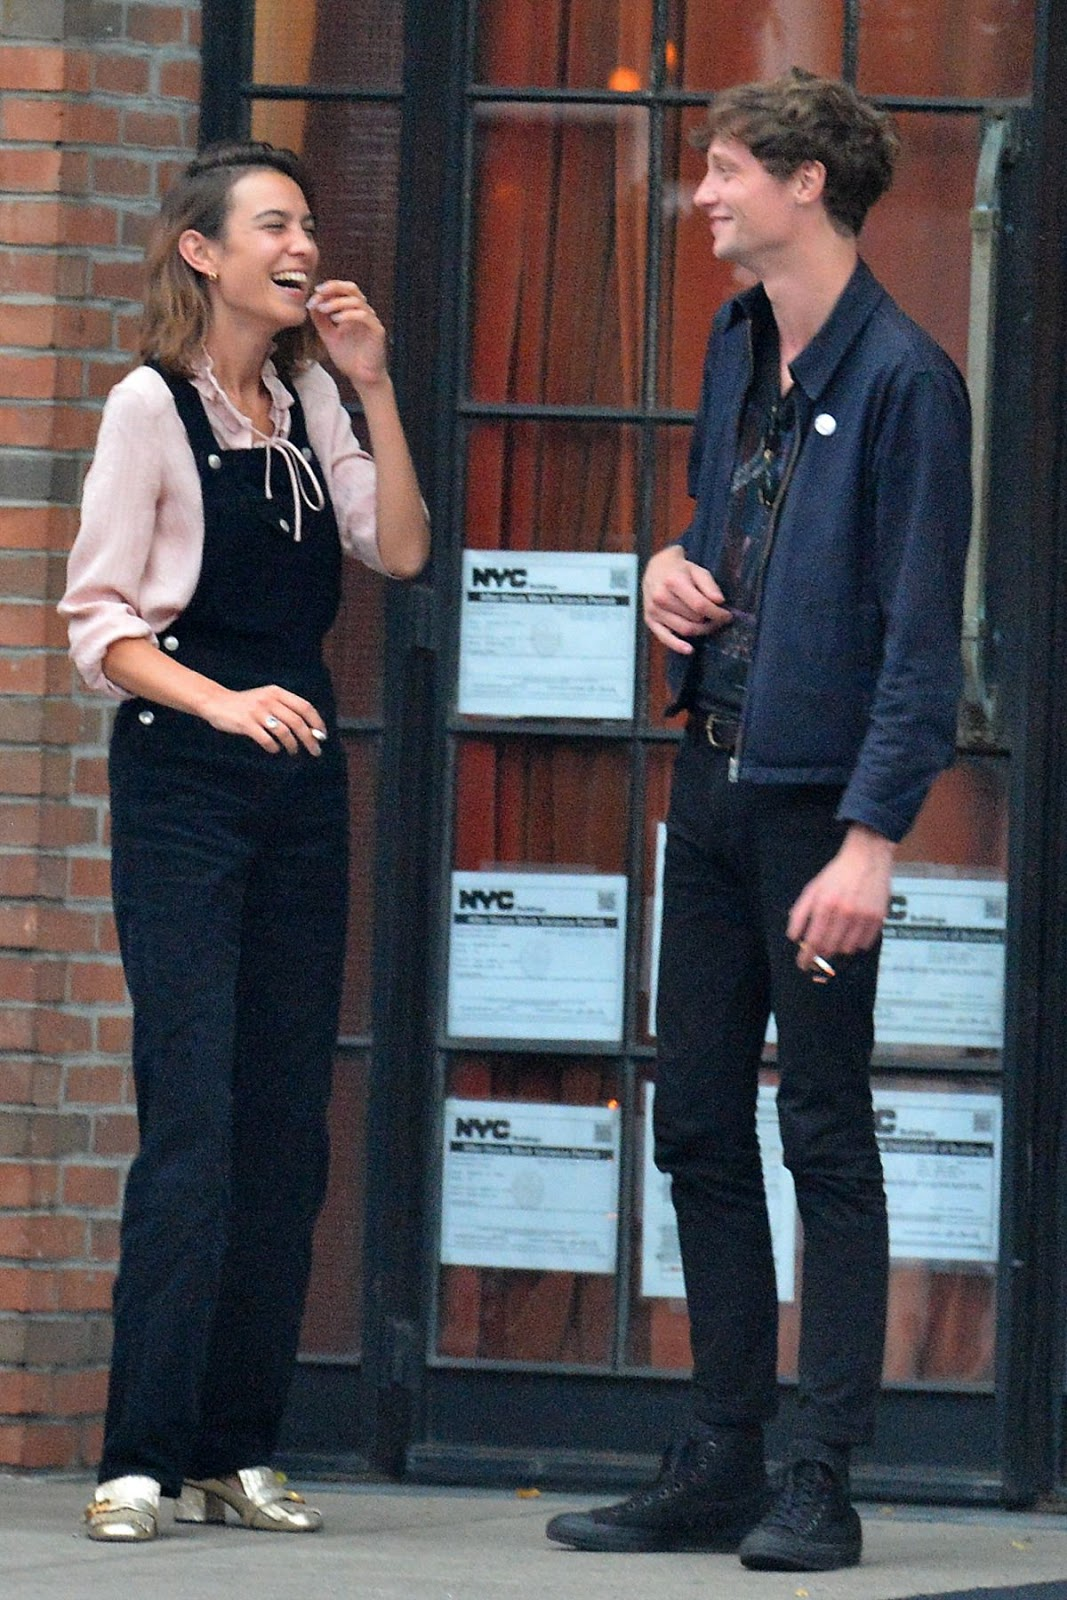 Alexa Chung Having a Smoke Break & snuggles up with ex-boyfriend Matthew Hitt in NY City